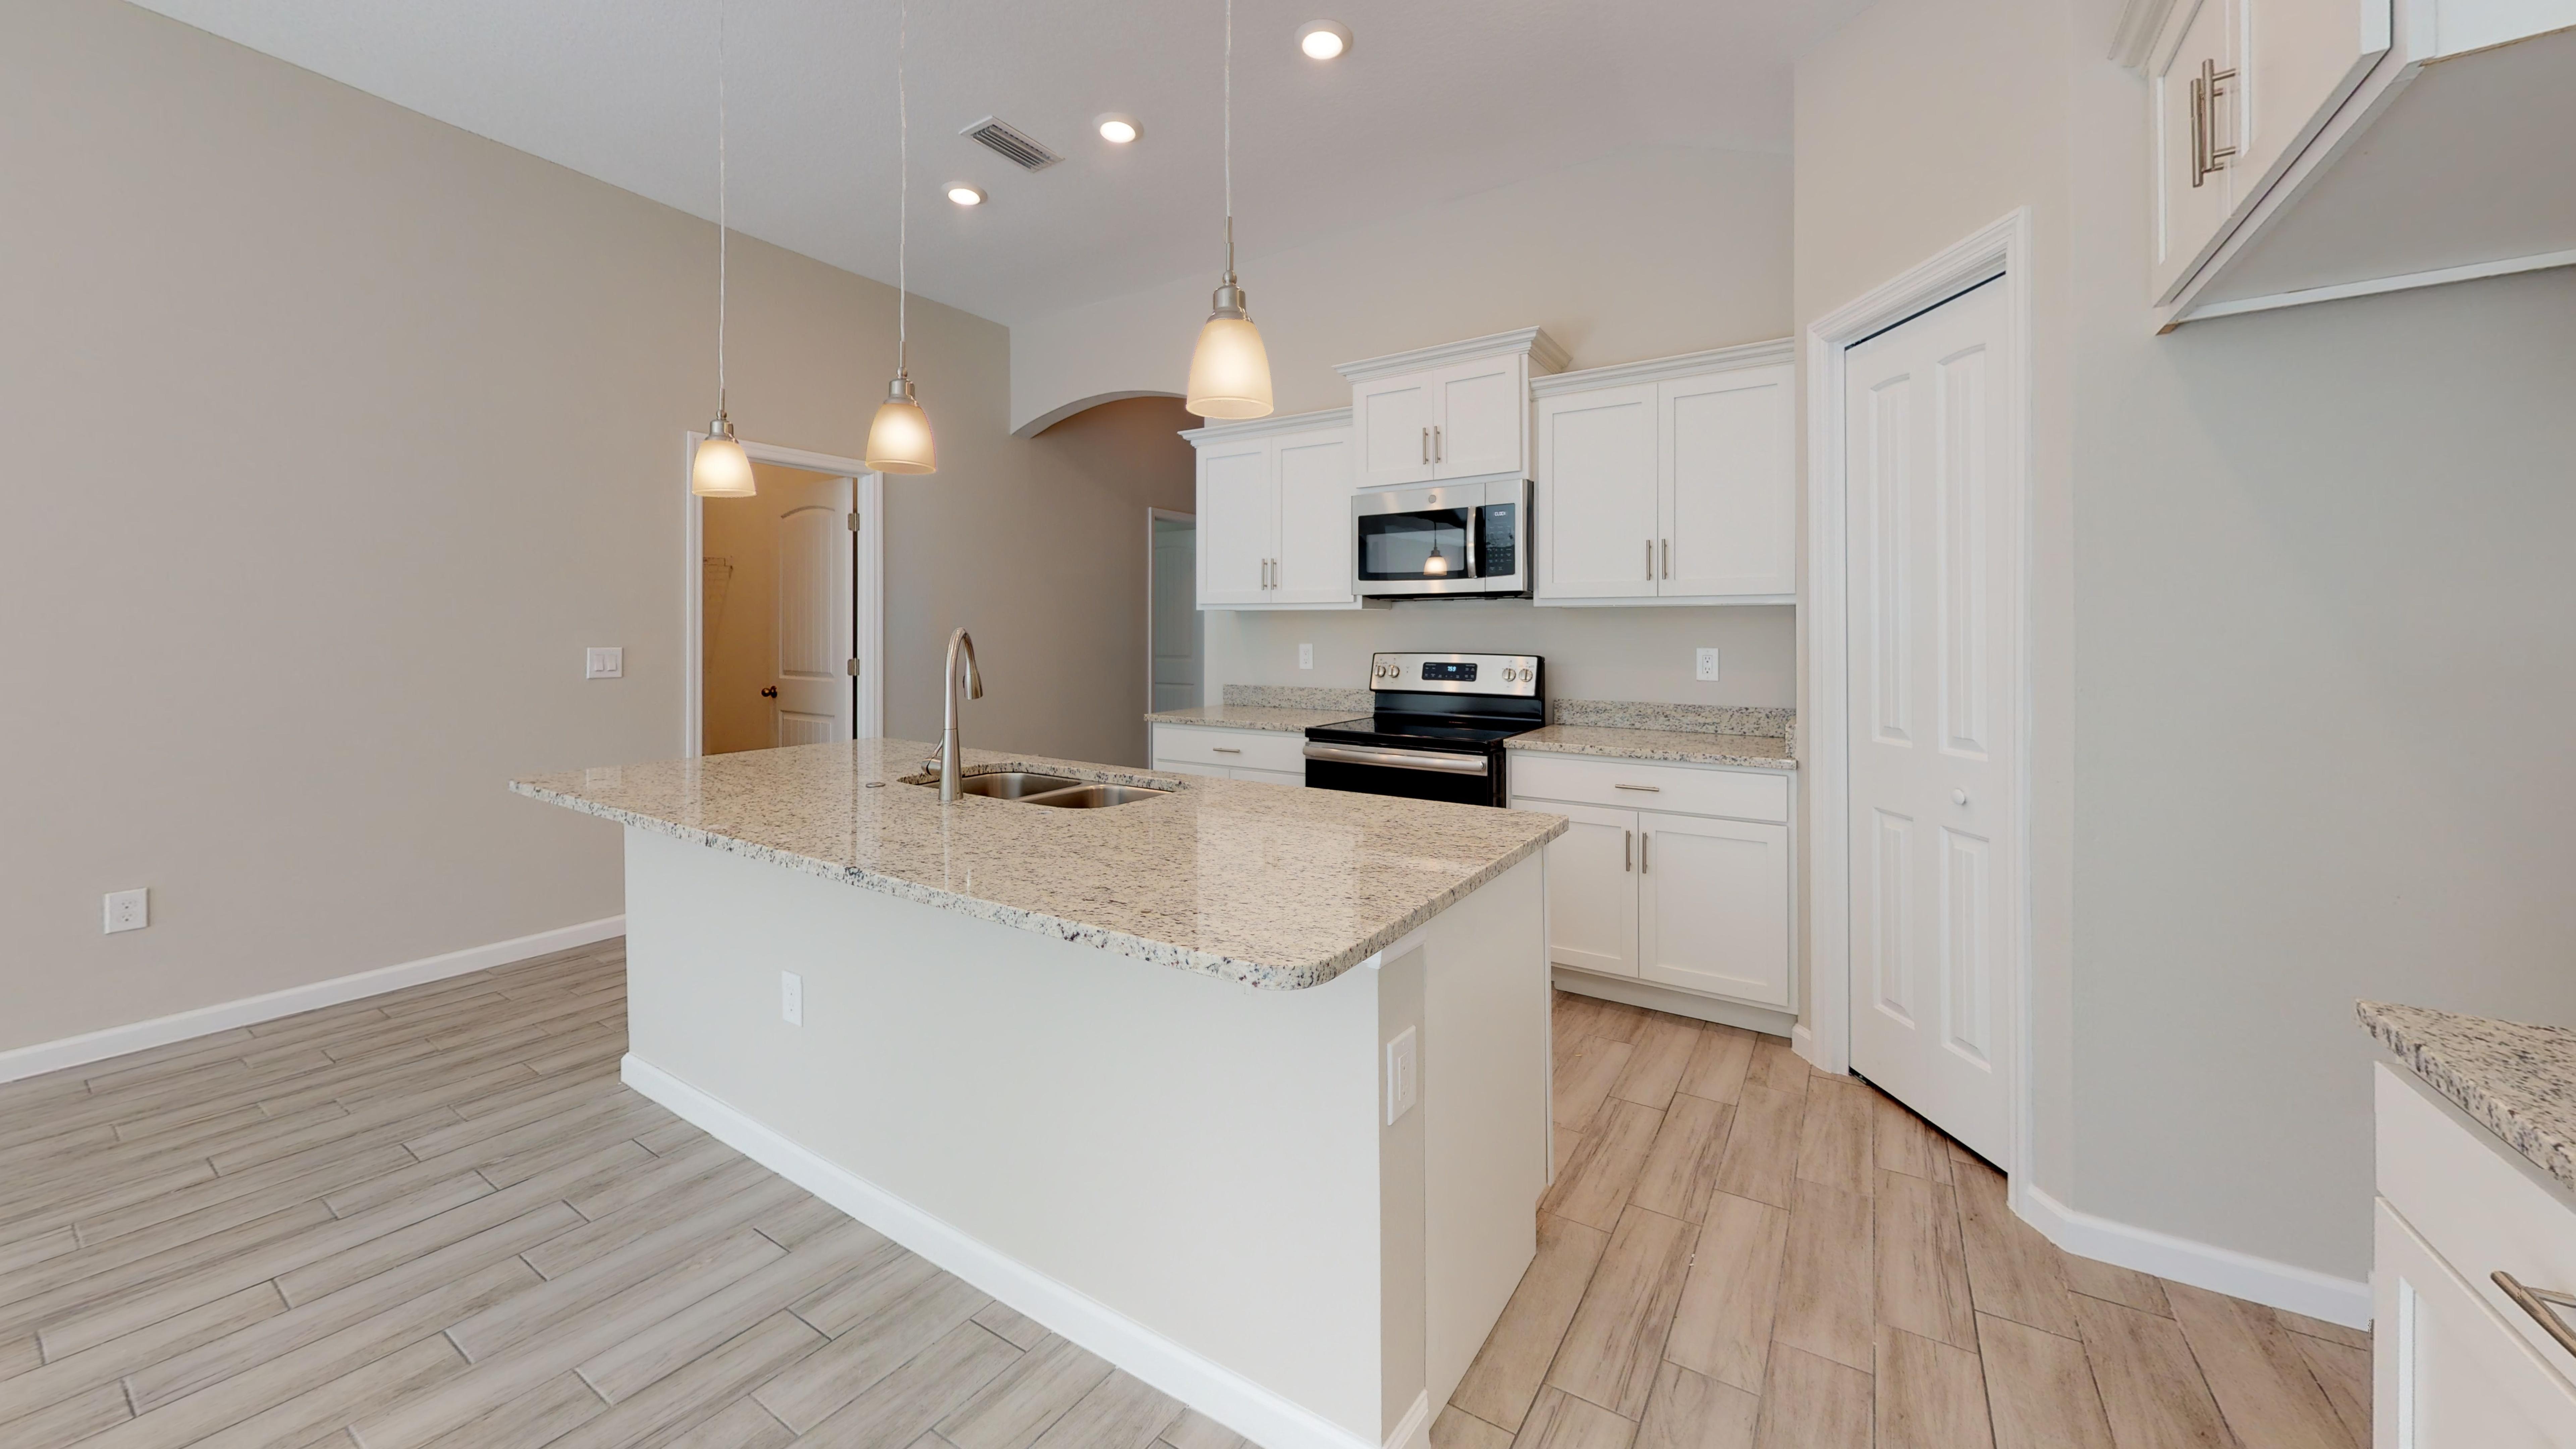 193-Denton-Ave-Kitchen